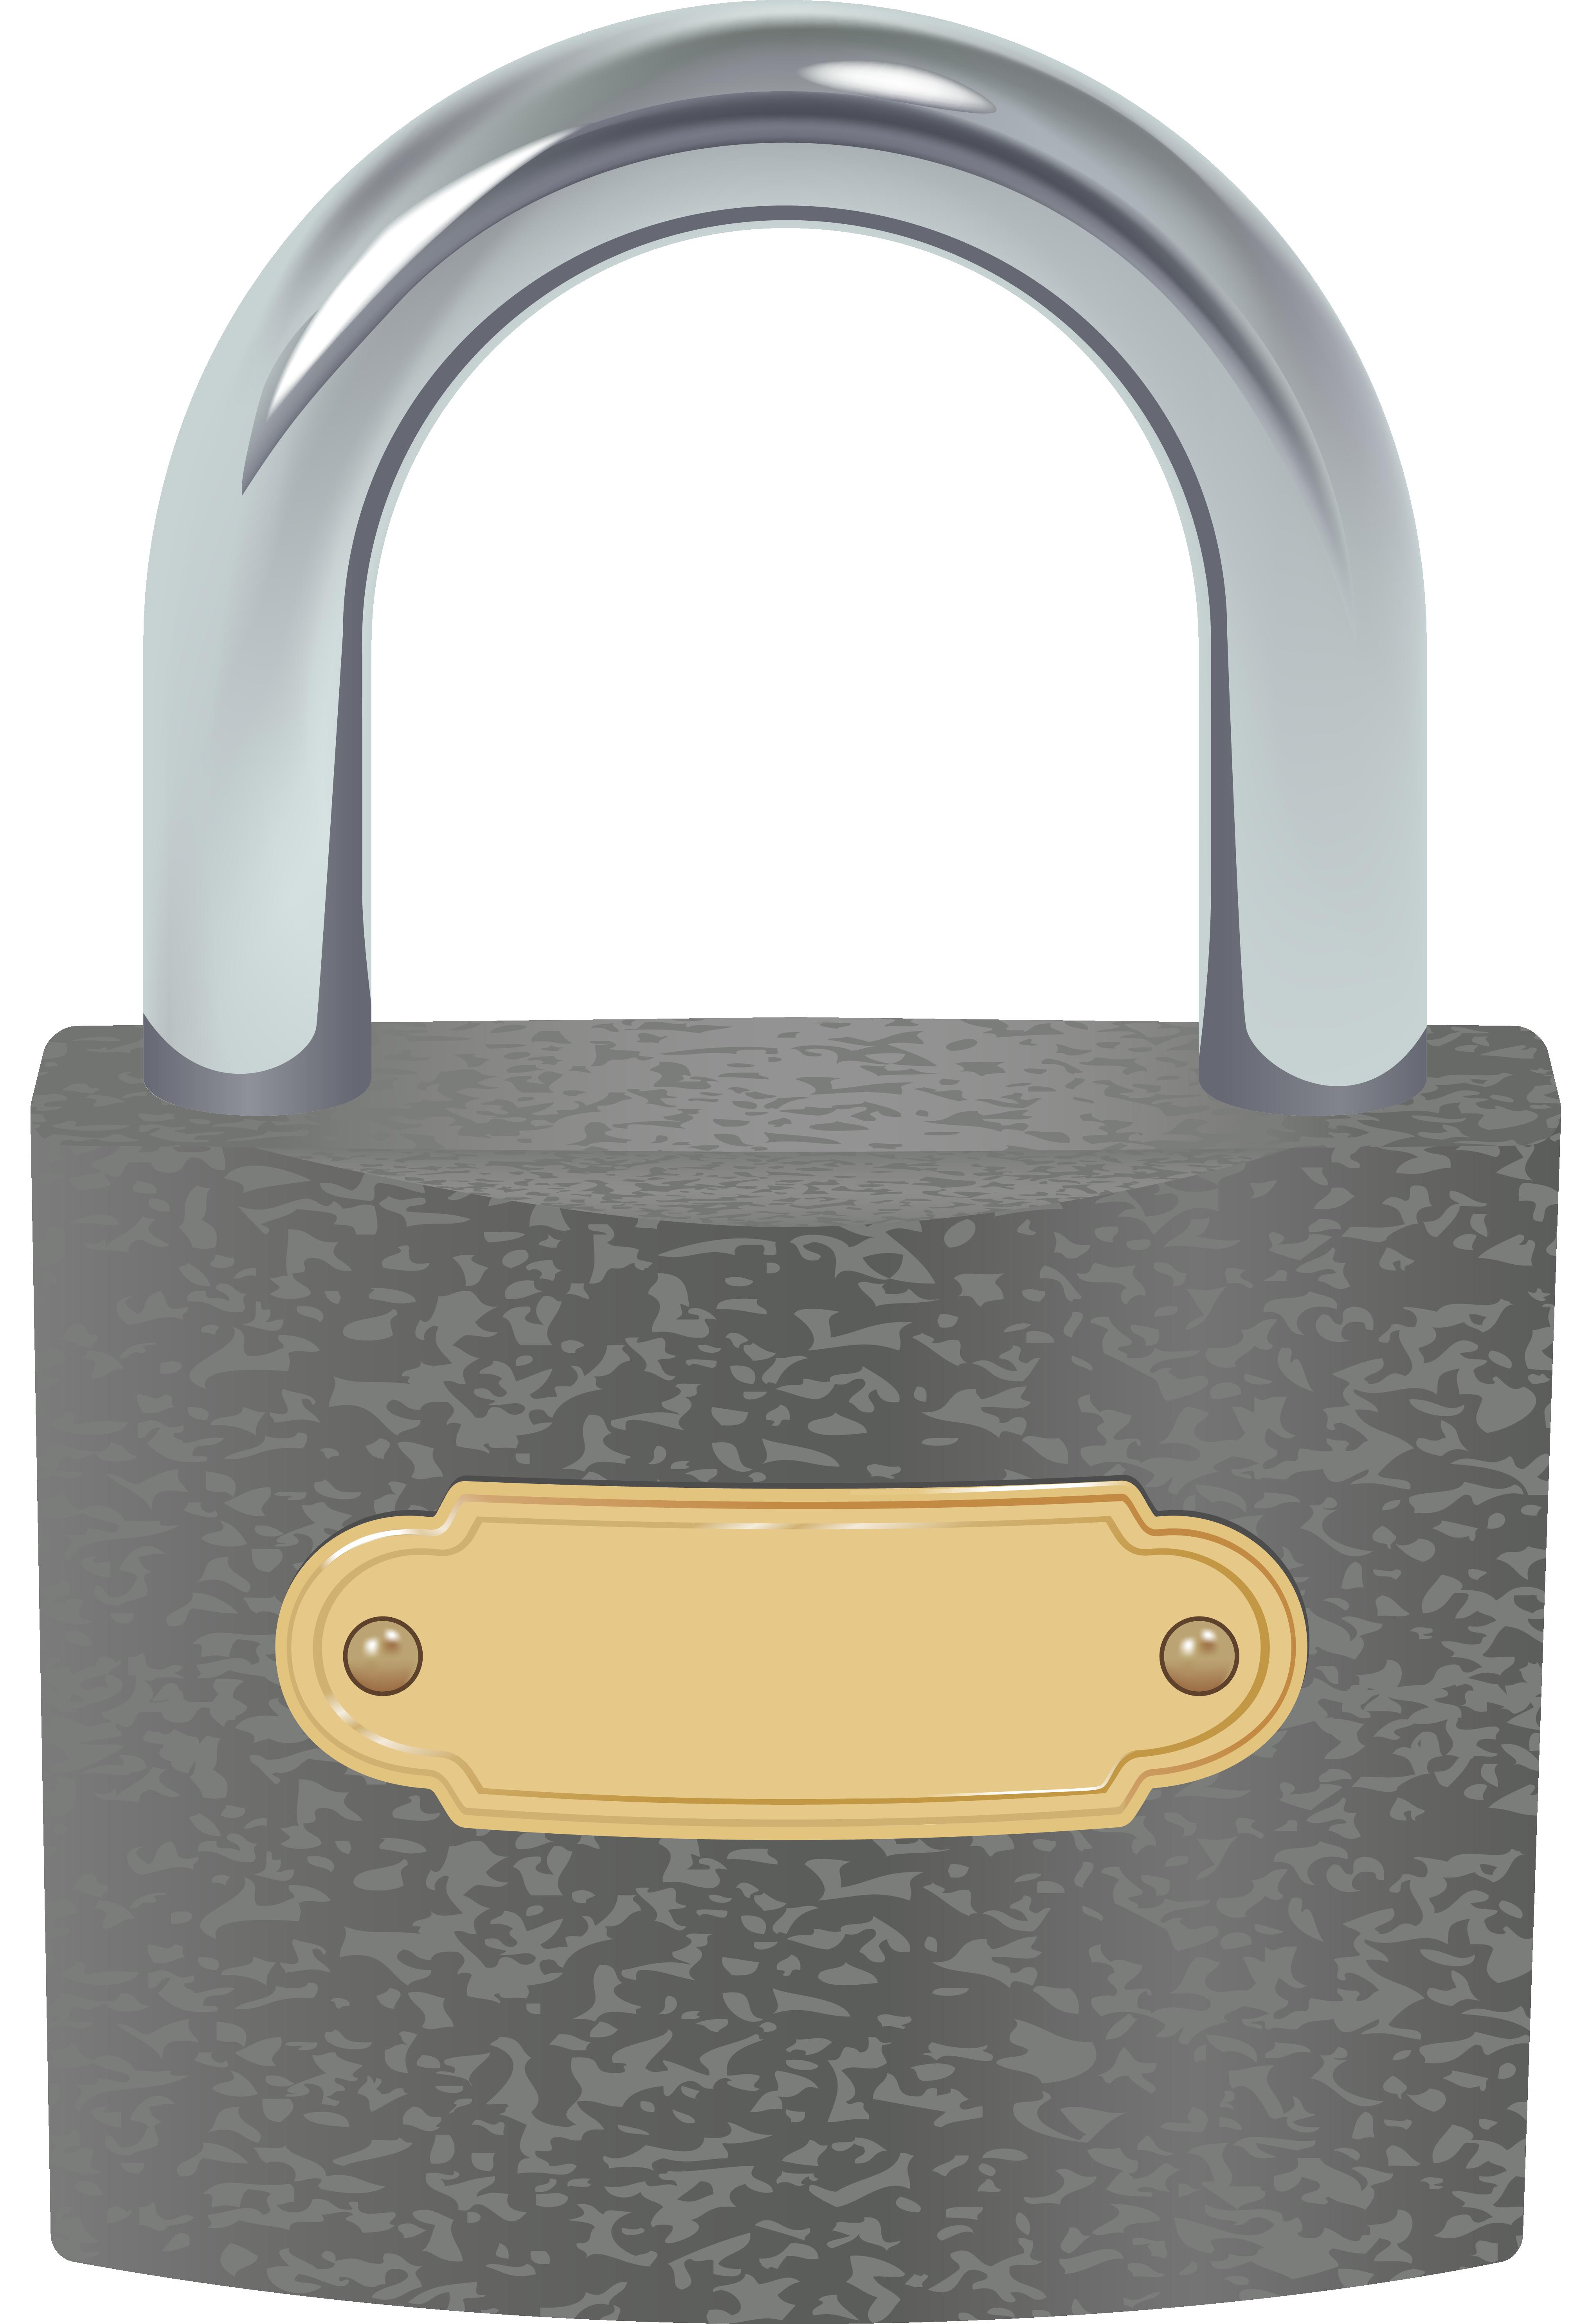 Lock clipart transparent. Padlock png clip art